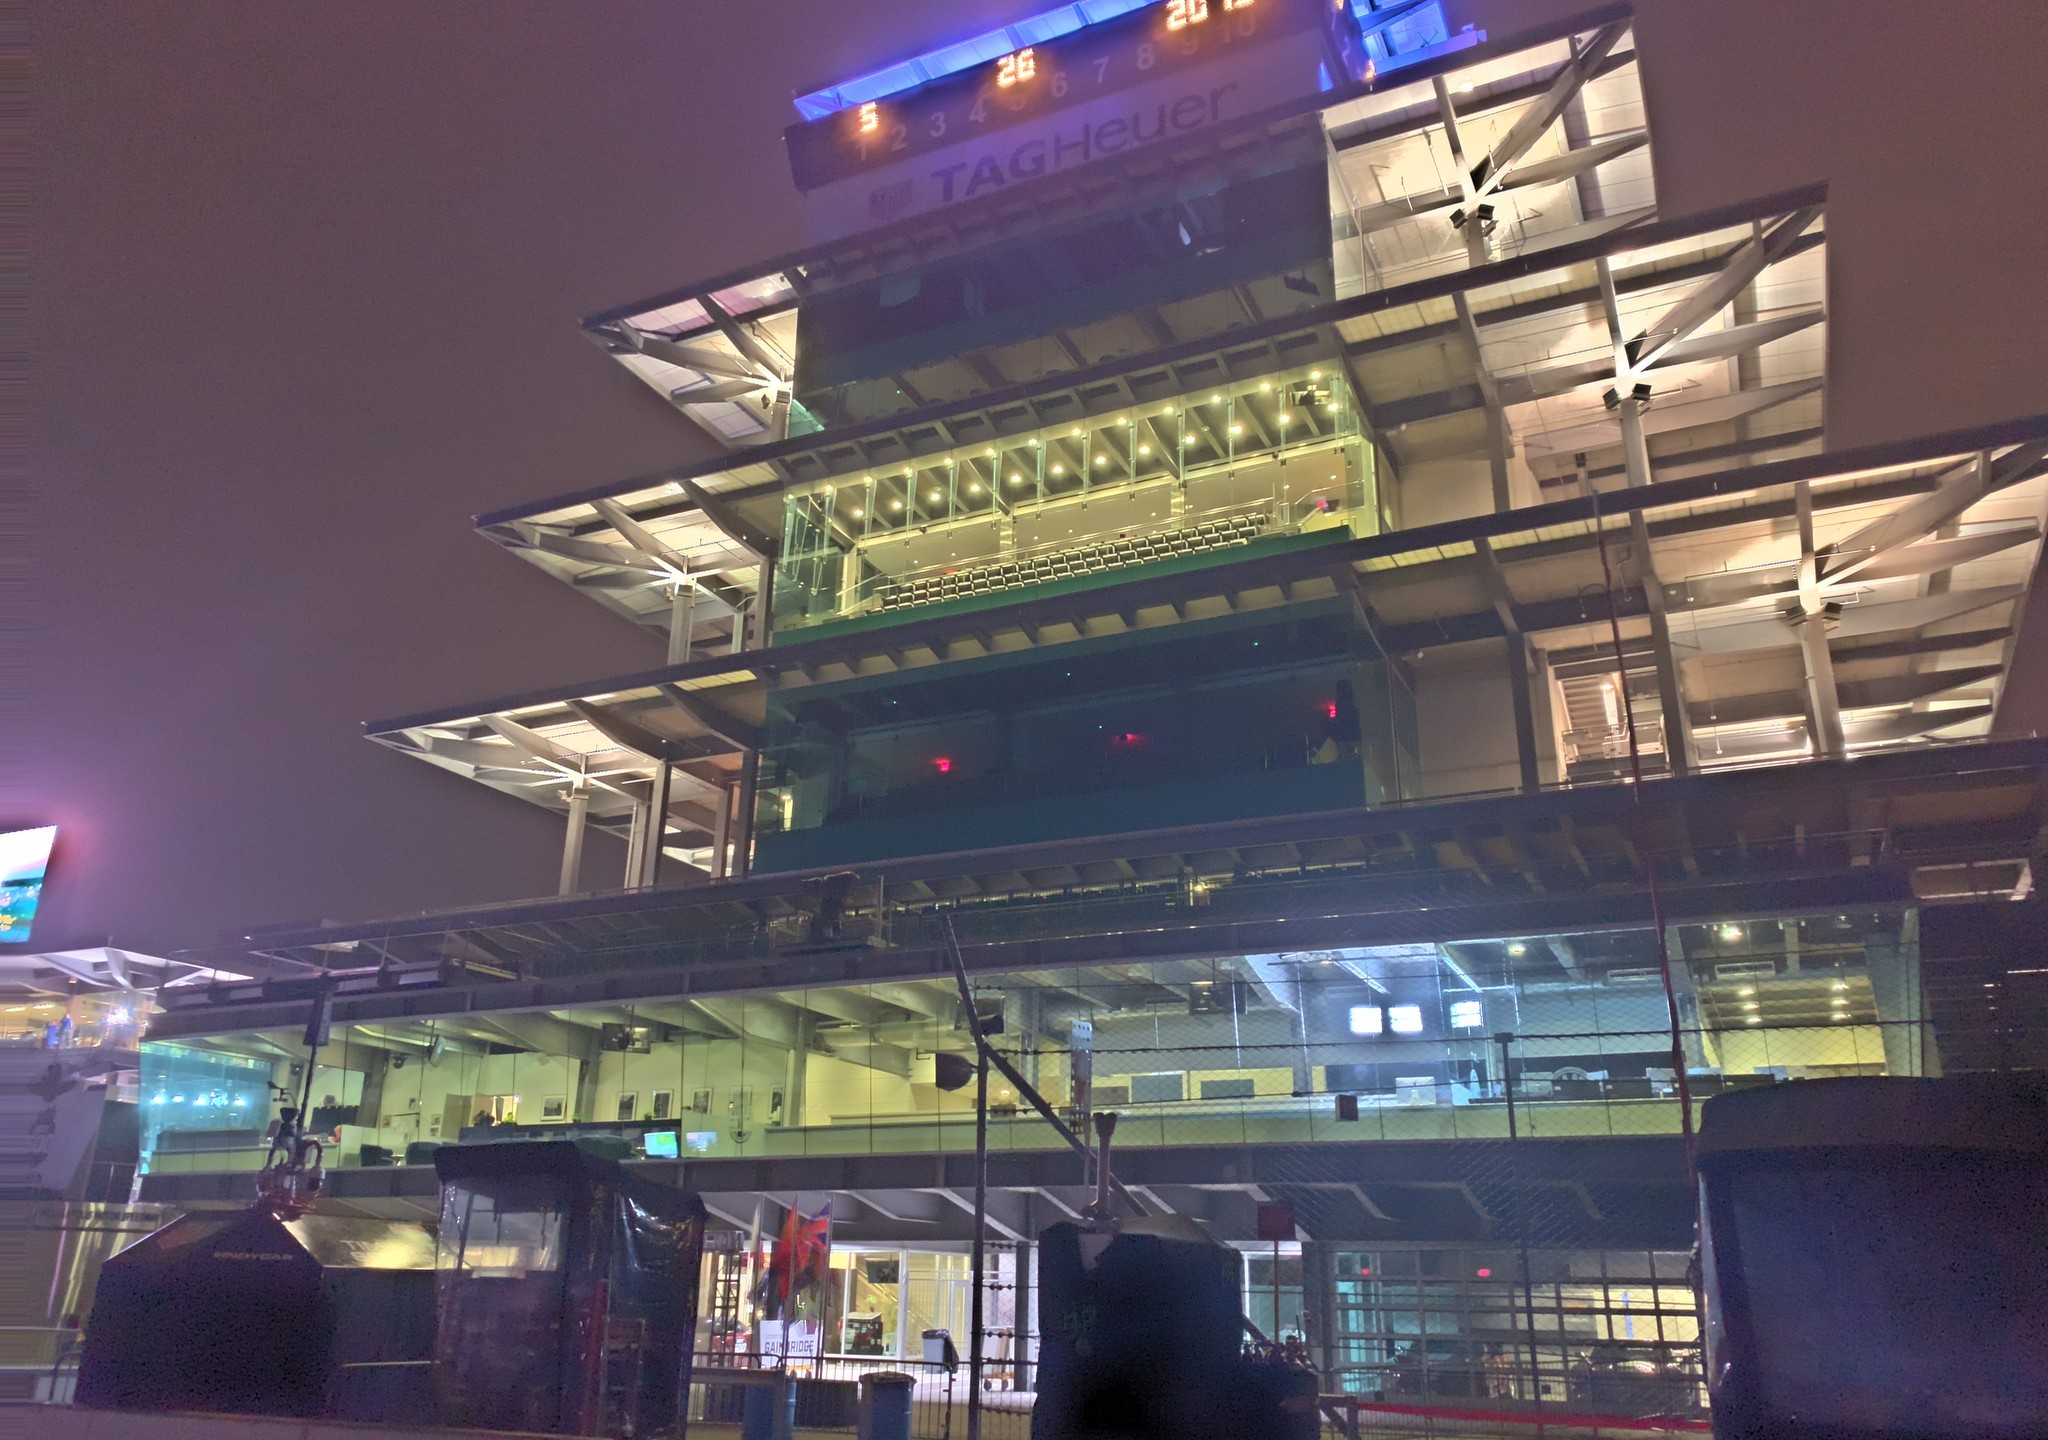 Indy 500 pagoda race morning 2019_1558860254709.jpg.jpg